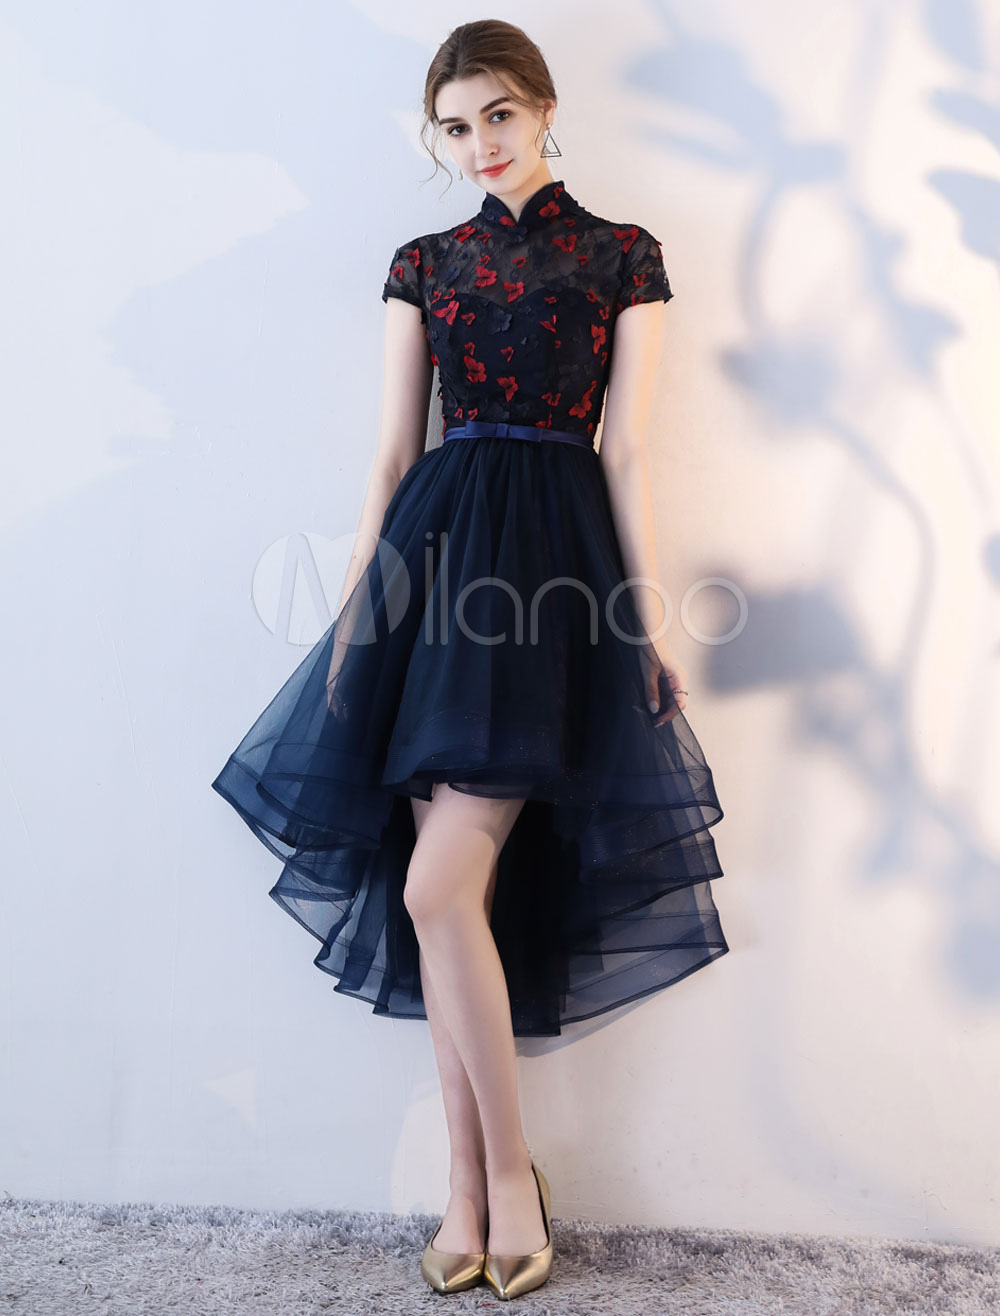 Cocktail Dresses Dark Navy High Low Graduation Dress Mandarin Collar Butterfly Bow Sash Party Dress